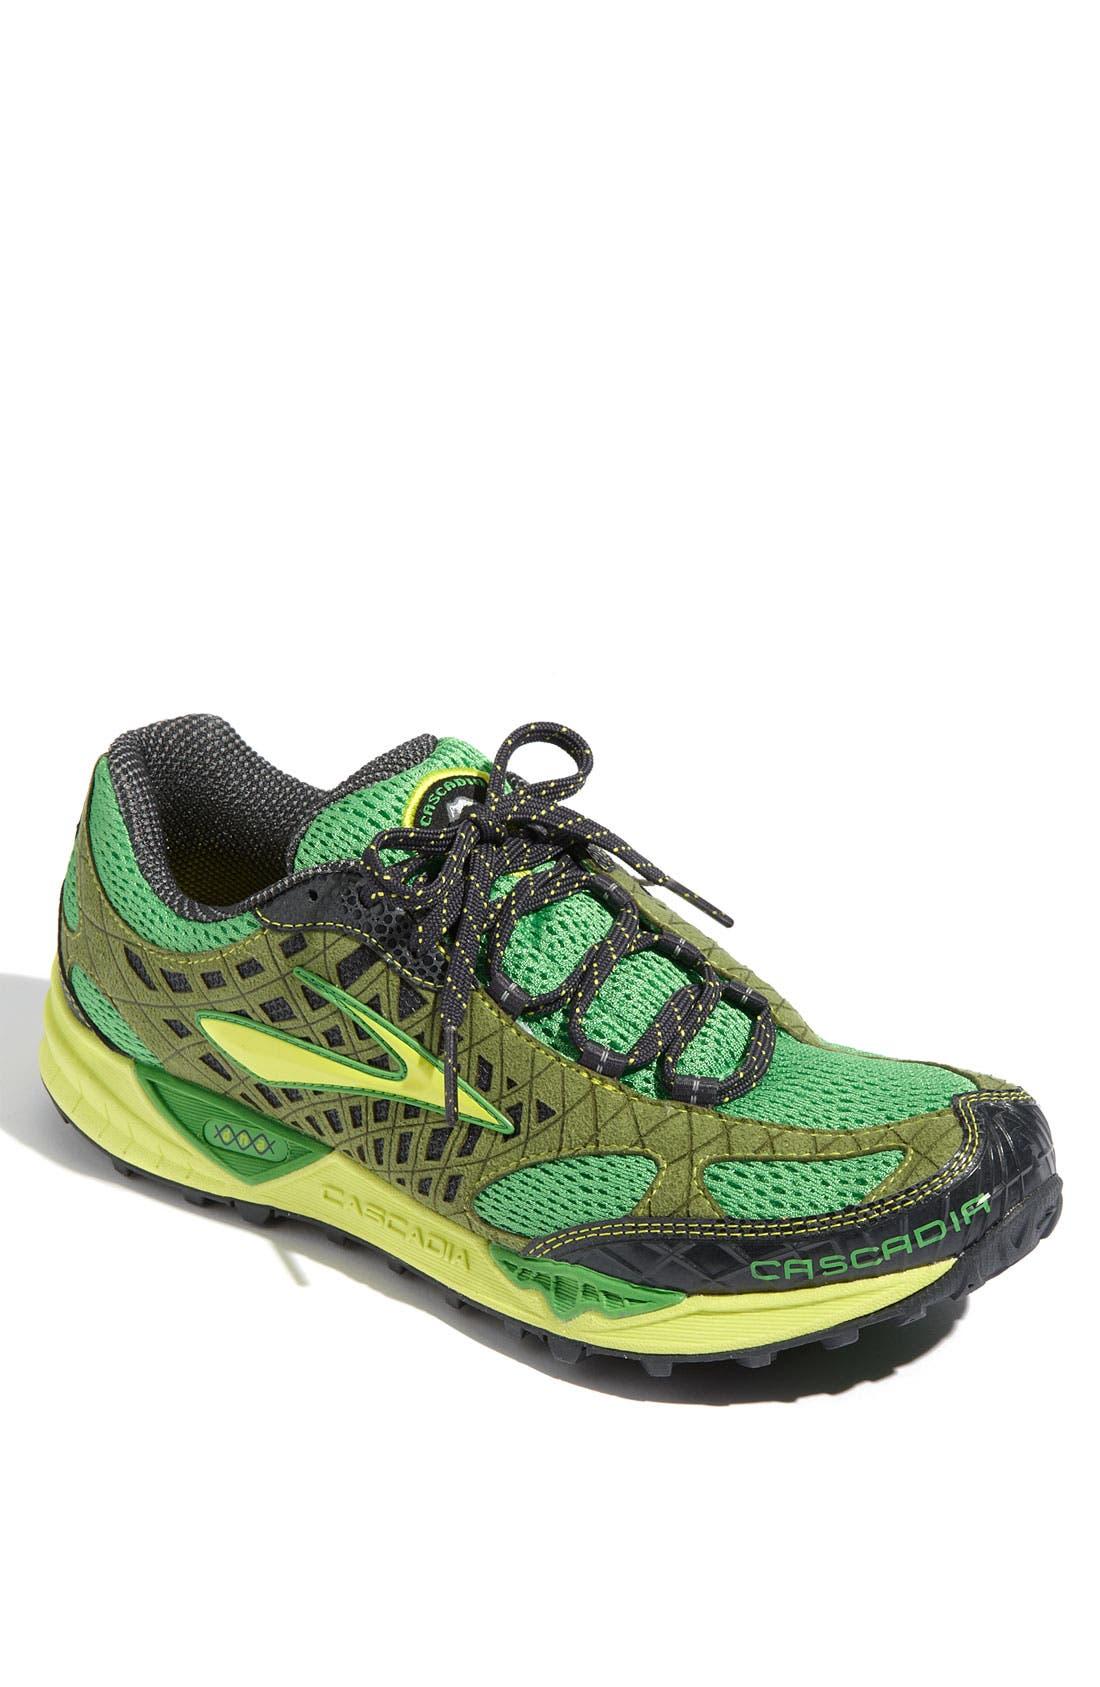 Main Image - Brooks 'Cascadia 7' Trail Running Shoe (Men)